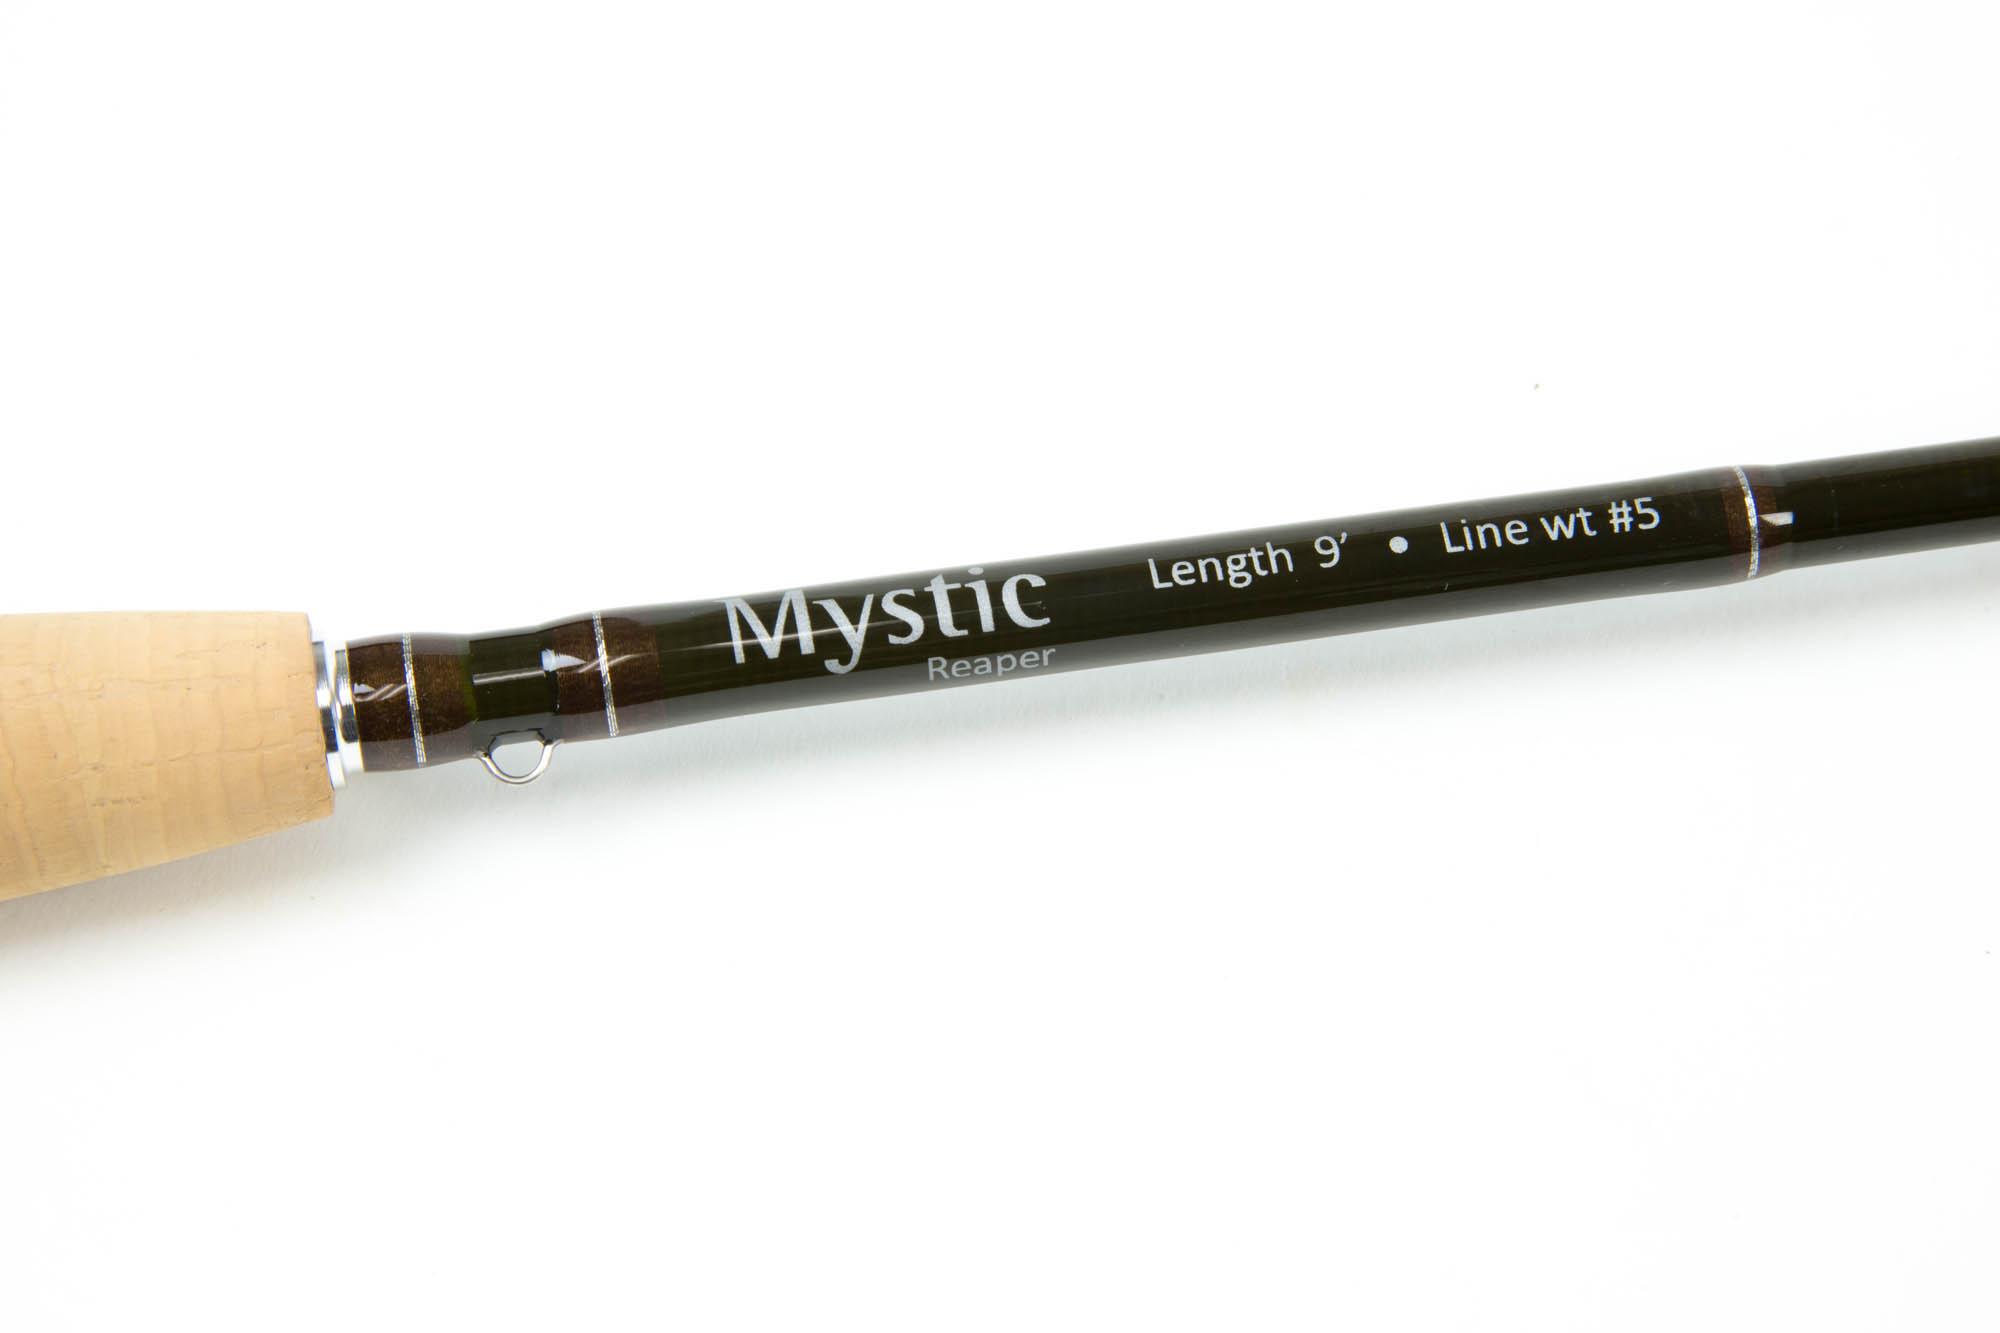 Mystic Reaper Fly Rod 35